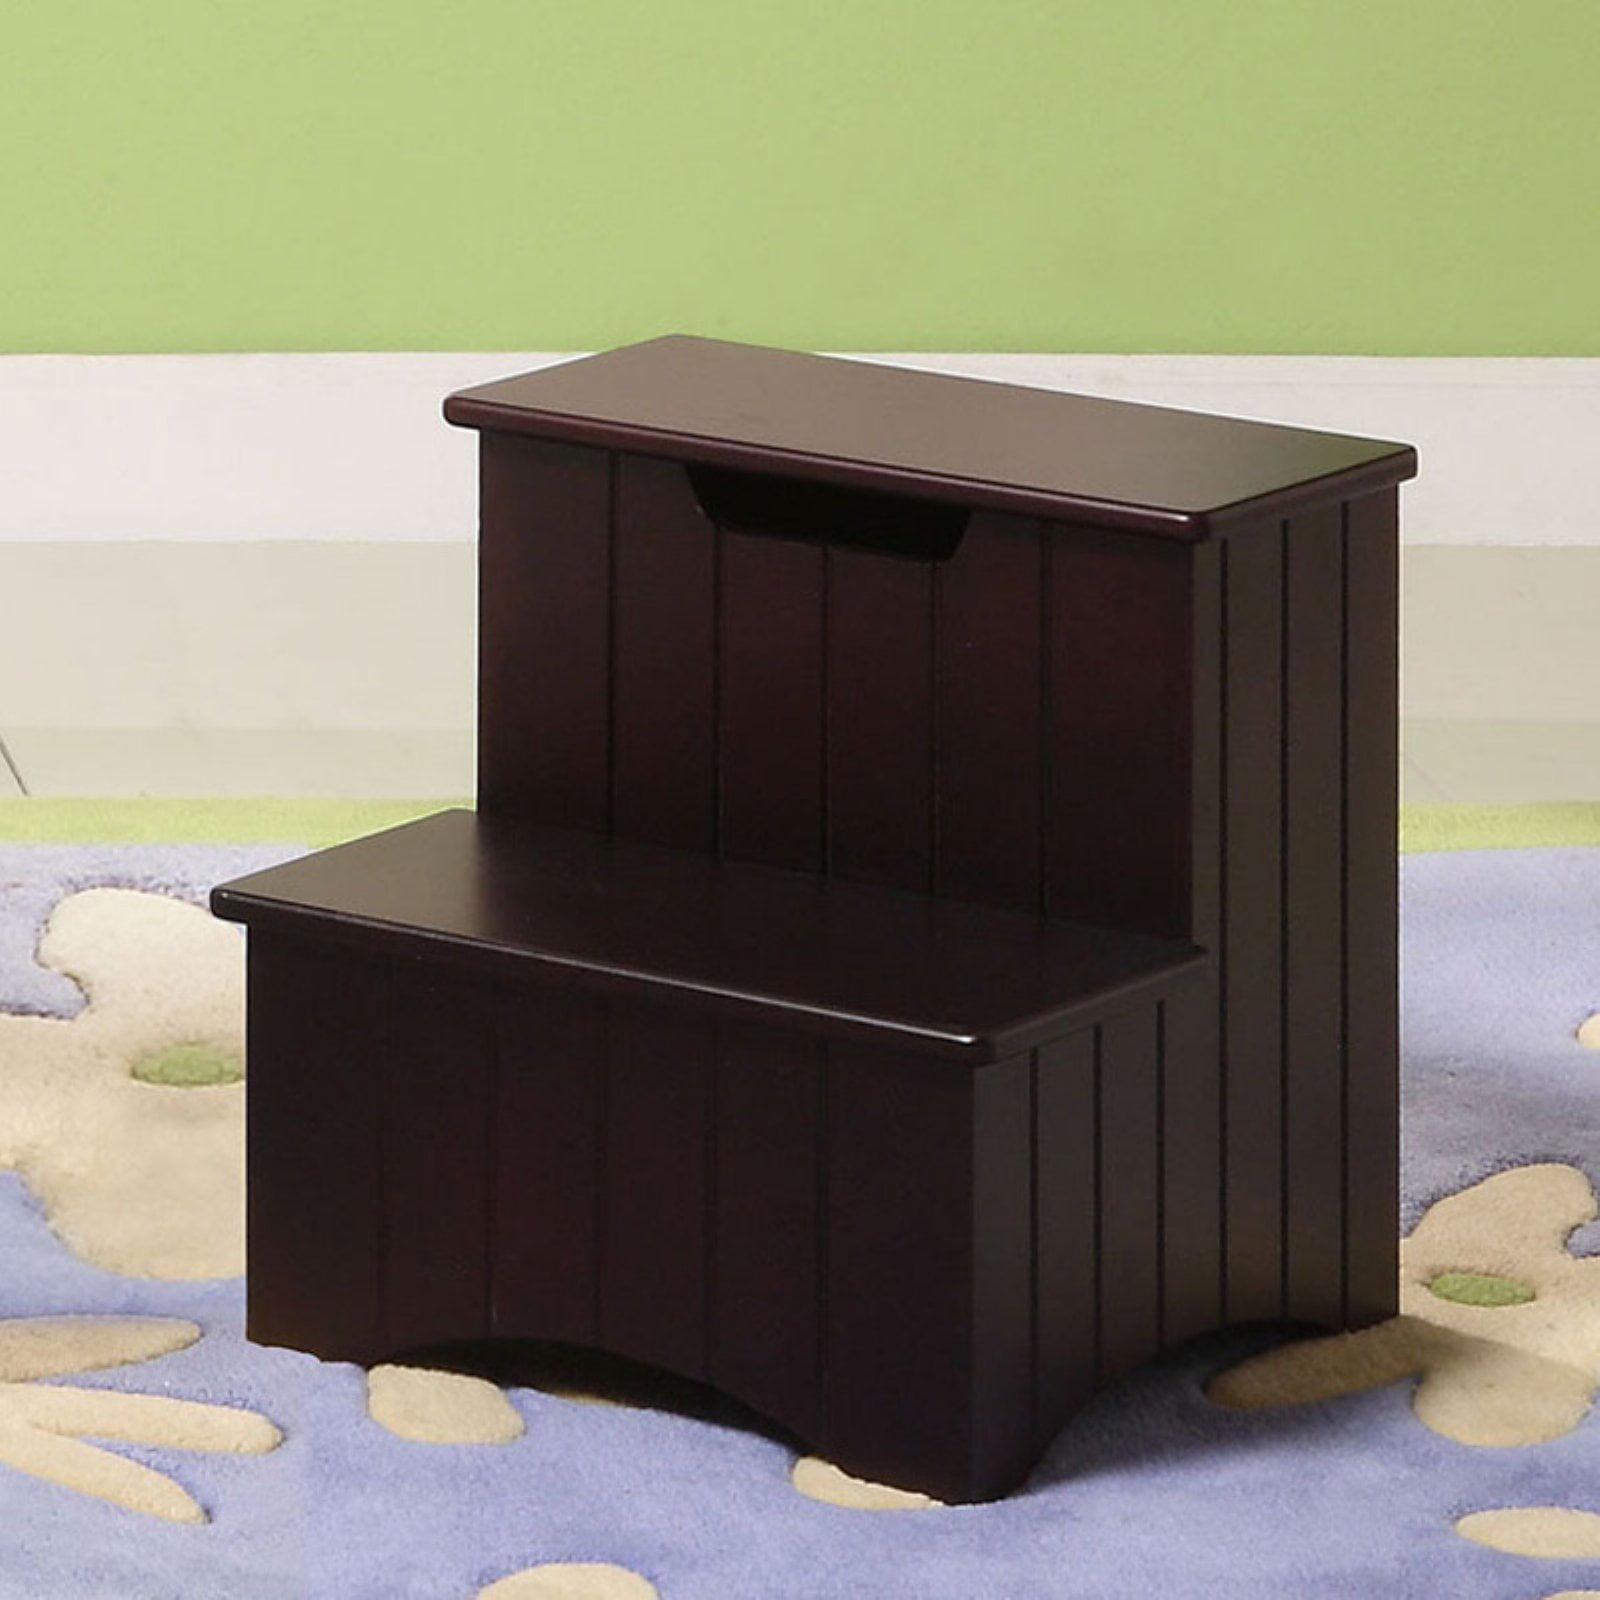 InRoom Designs Storage Step Stool I by InRoom Designs